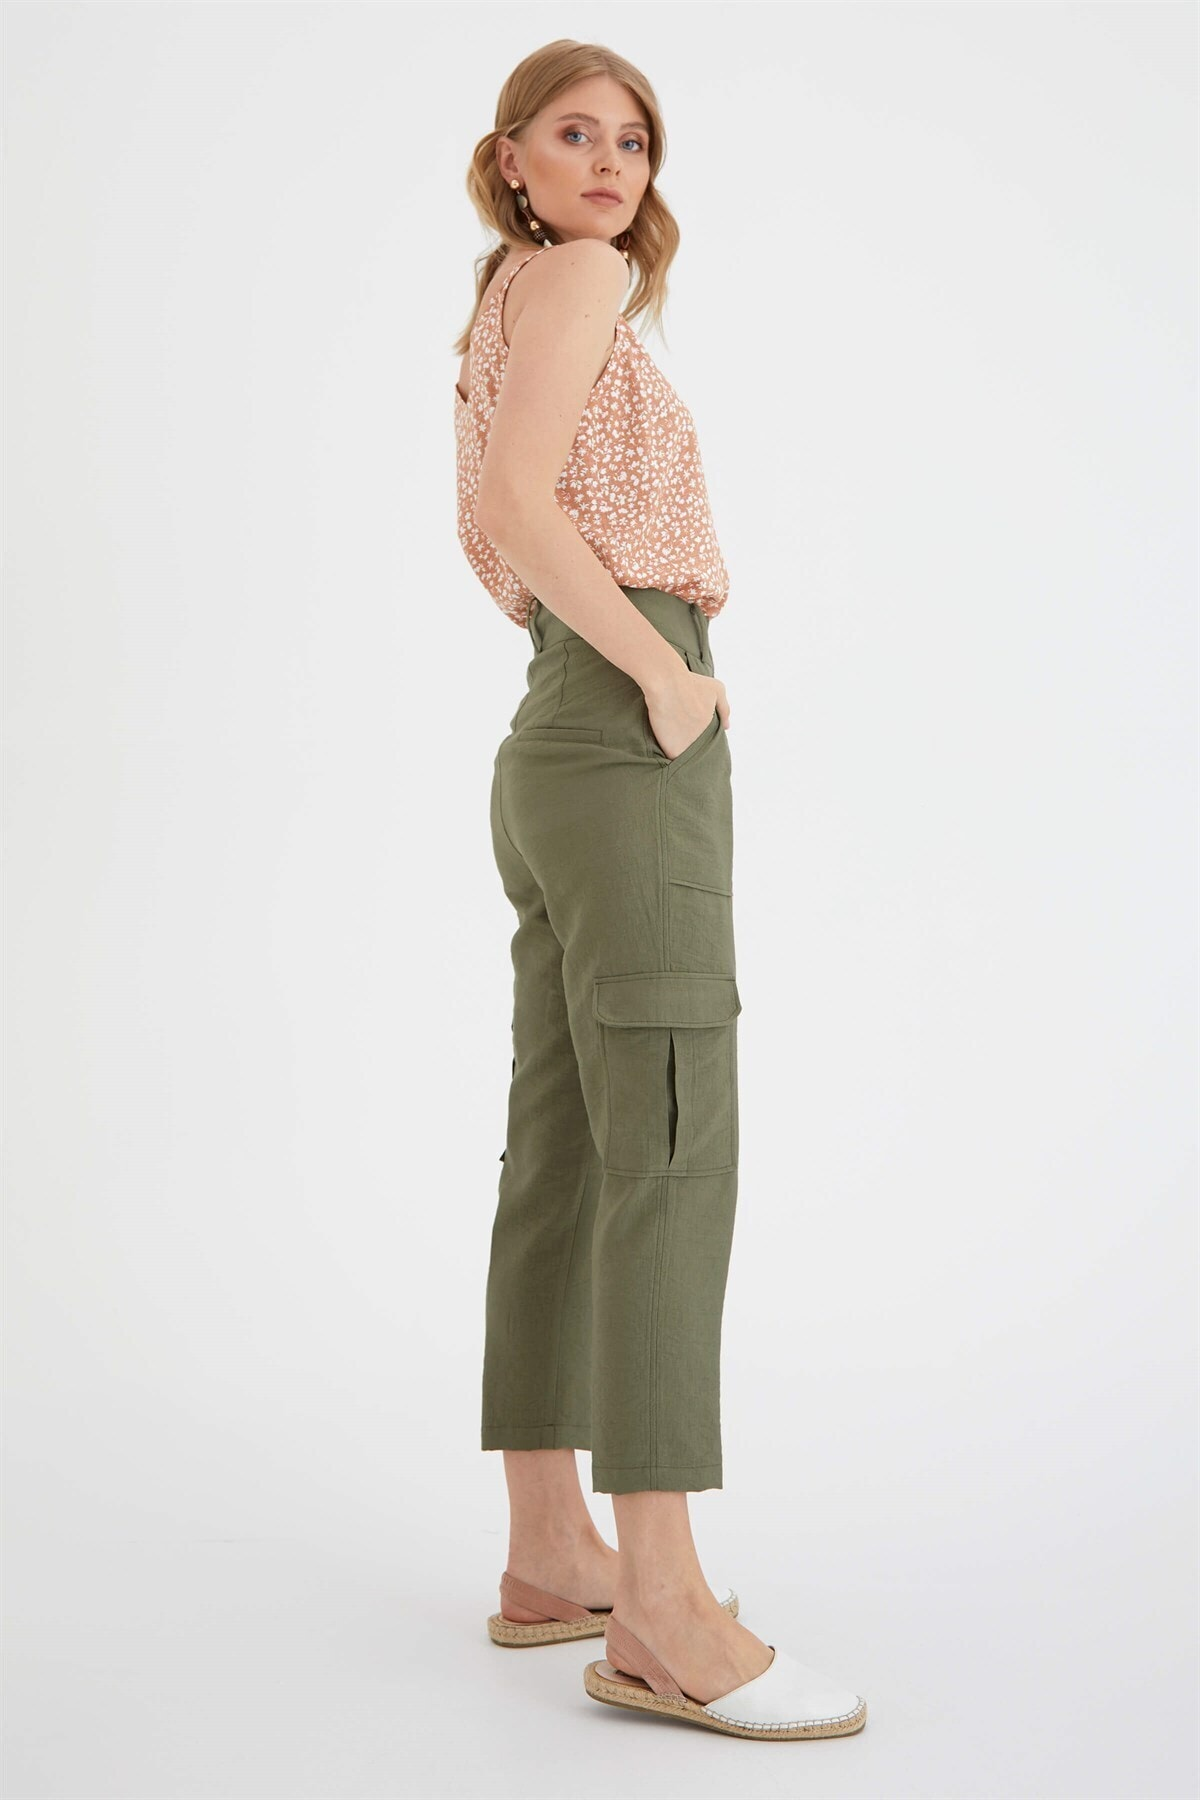 Chima Kadın Haki Kargo Pantolon 2